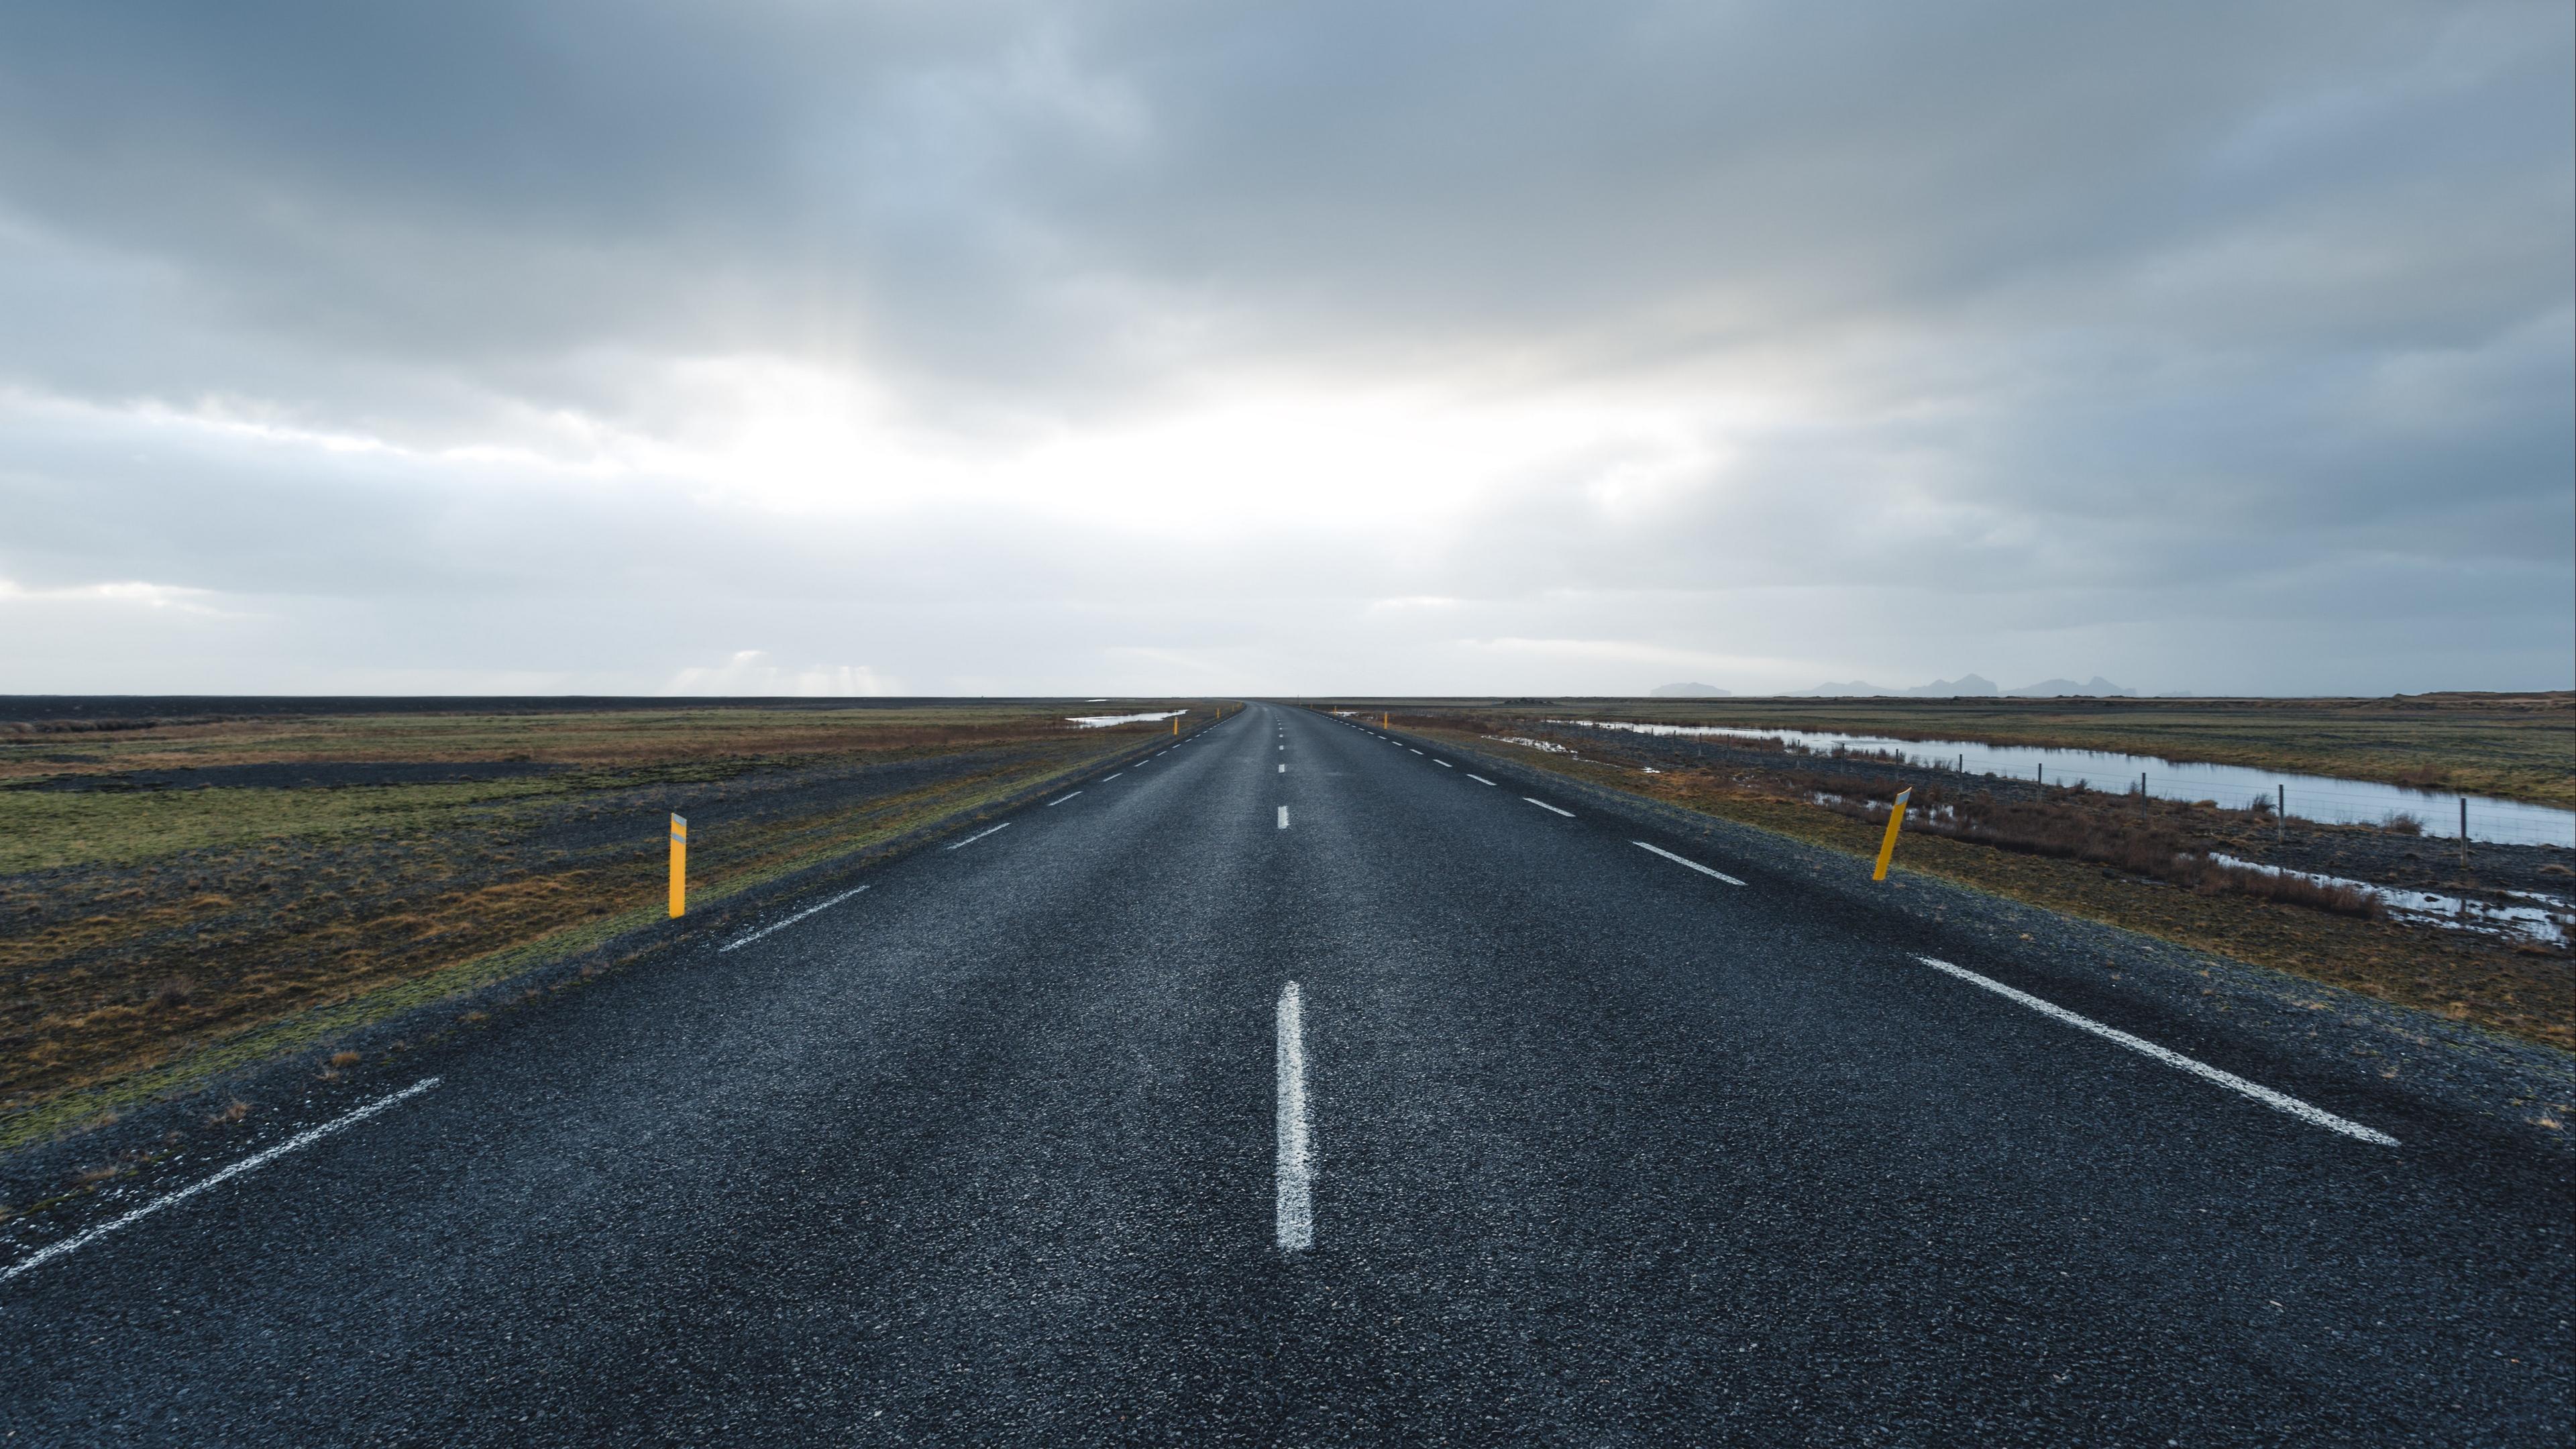 road horizon sky 4k 1541114083 - road, horizon, sky 4k - Sky, Road, Horizon